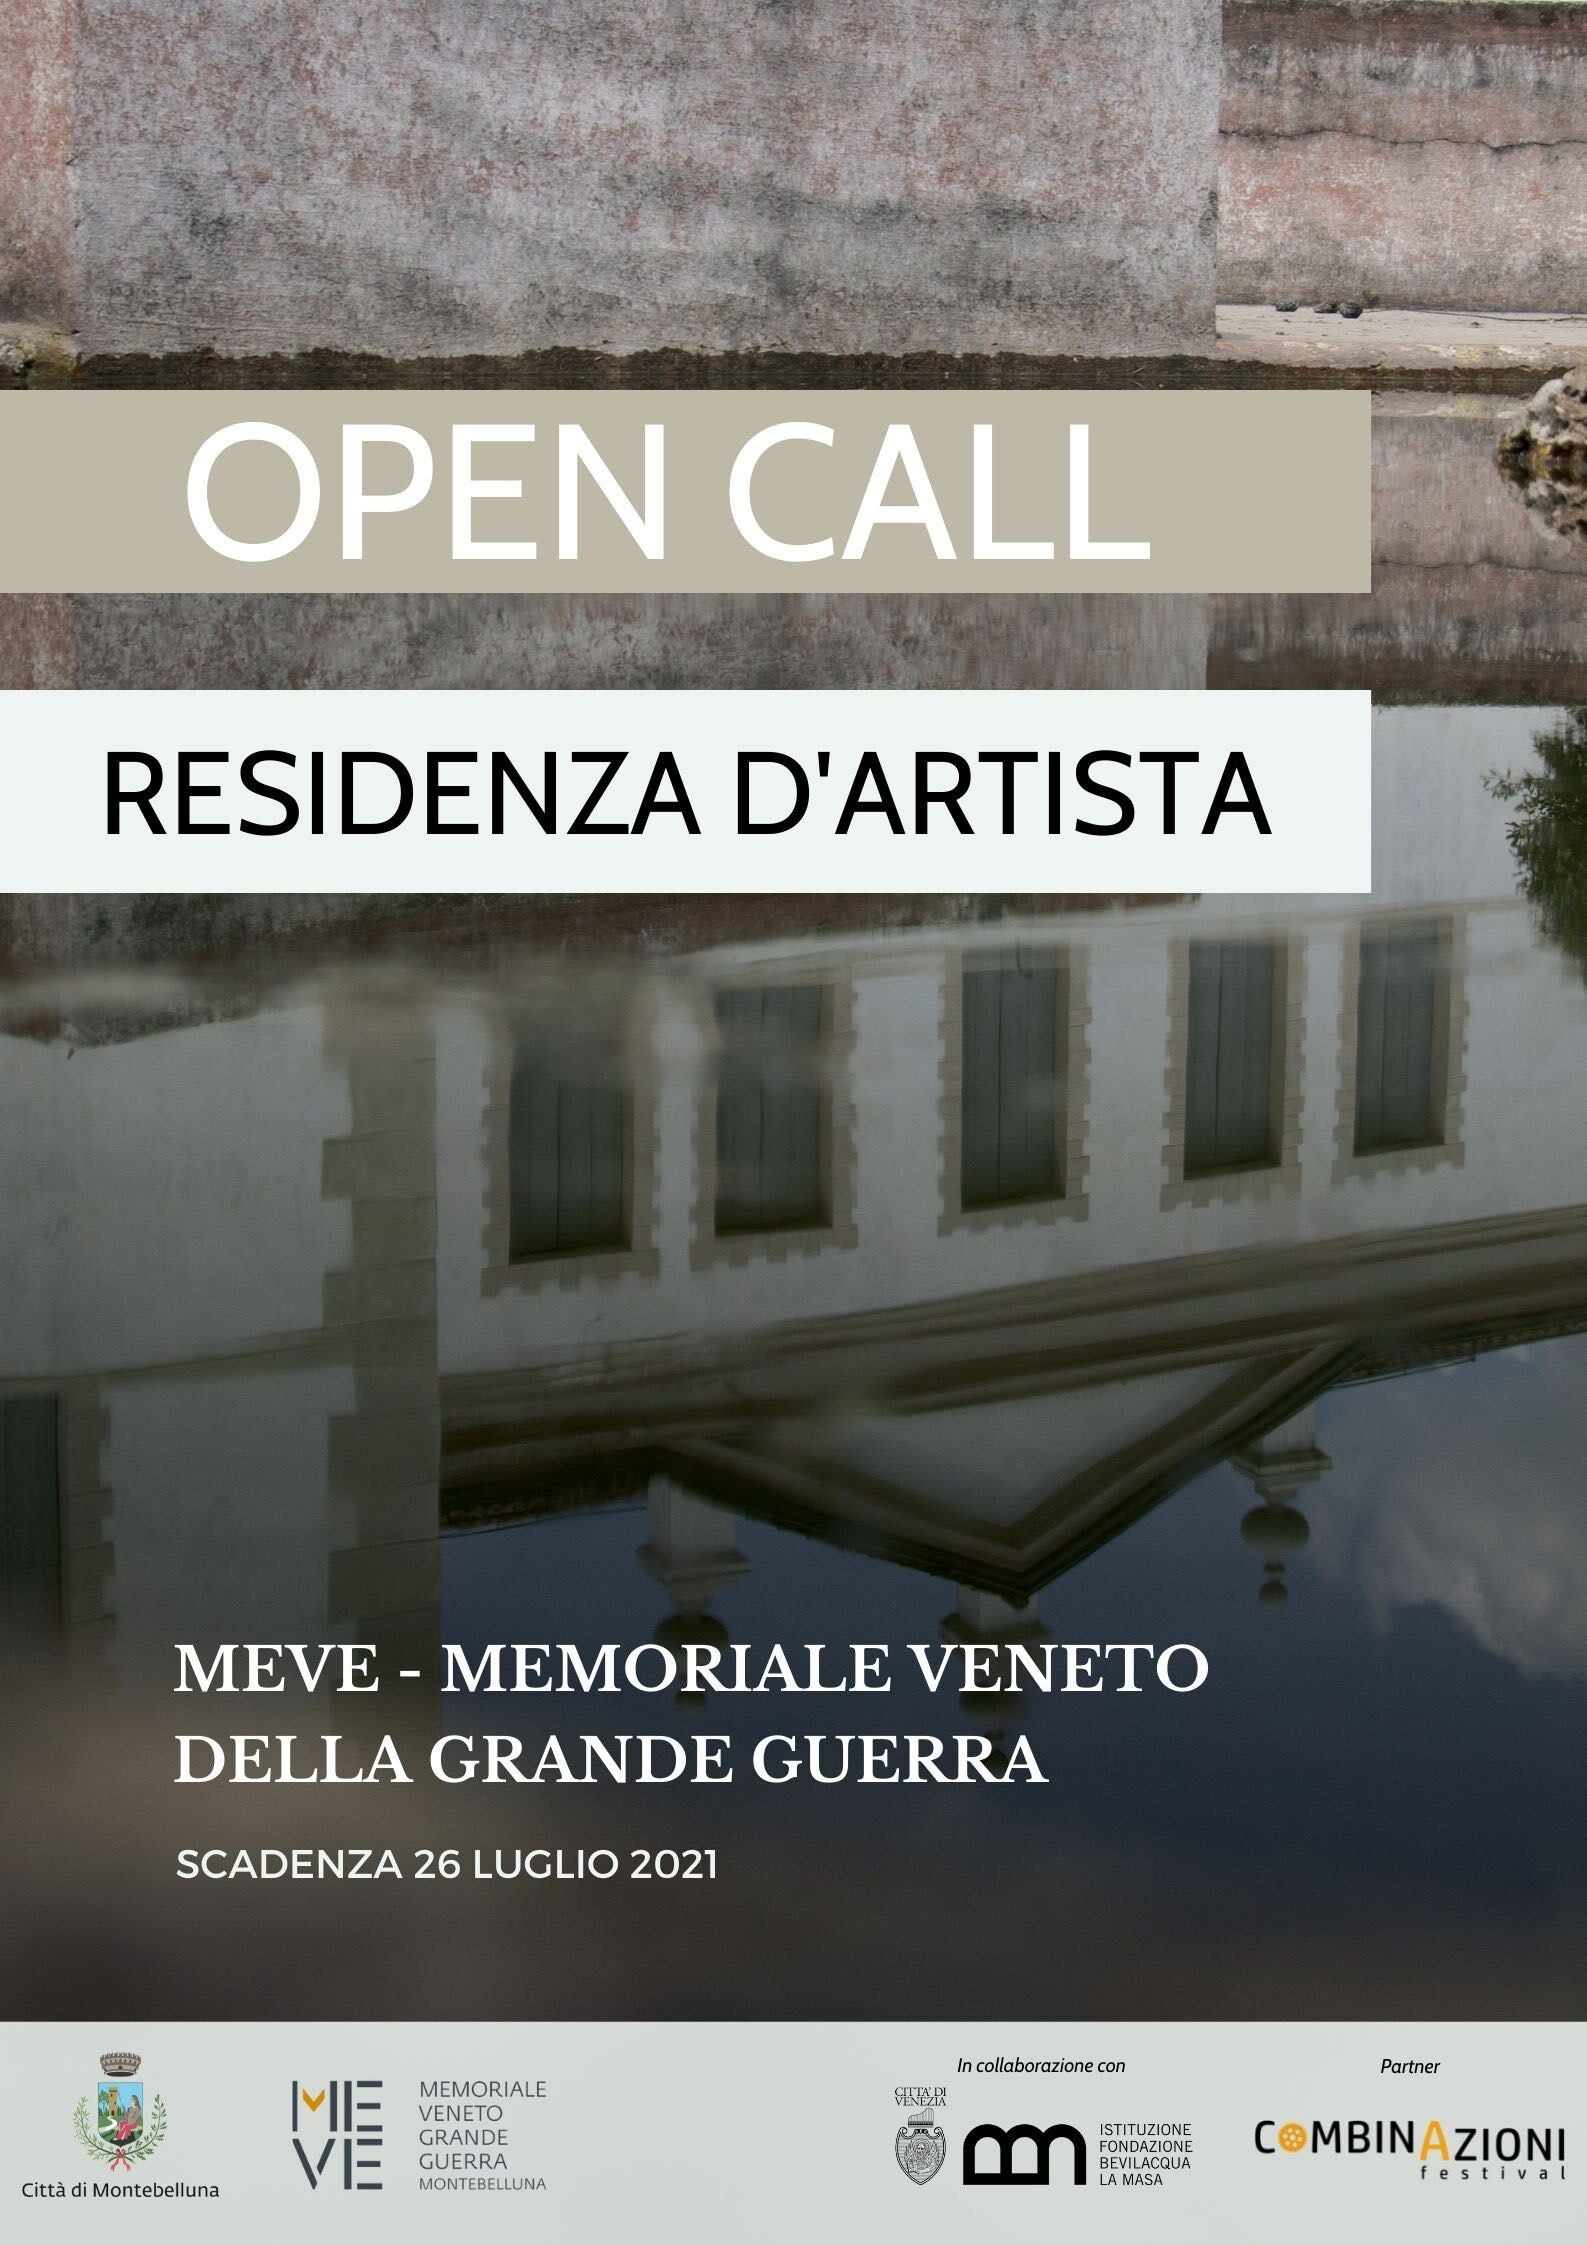 https://combinazionifestival.it/wp-content/uploads/2021/07/open-call-residenza-1587x2245.jpg